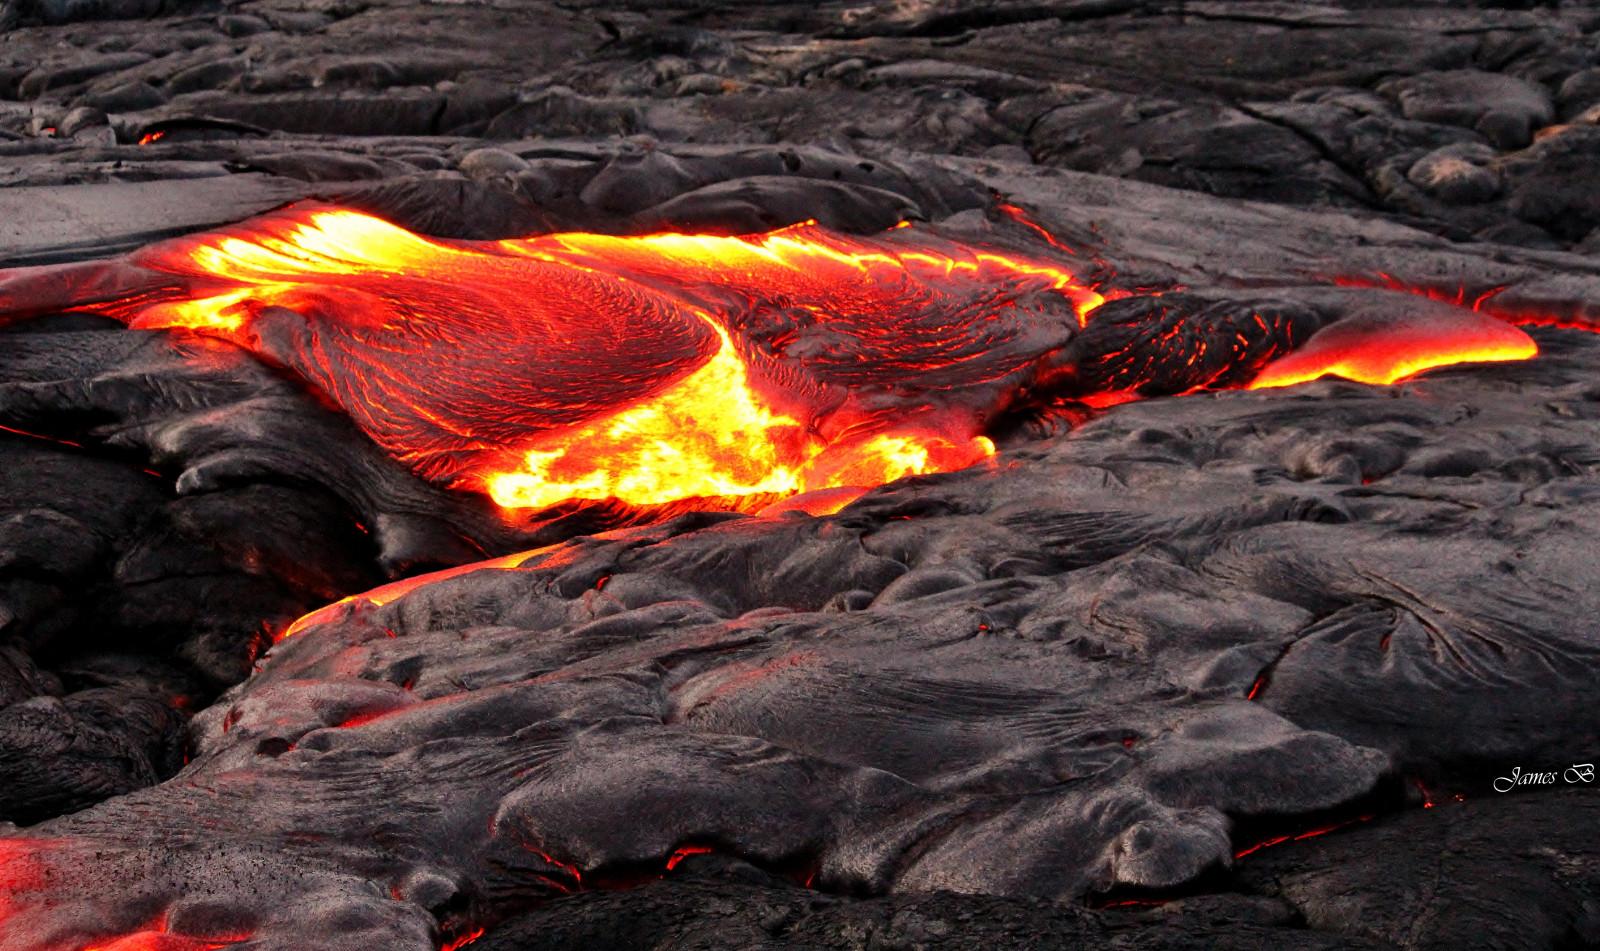 wie heiß ist lava